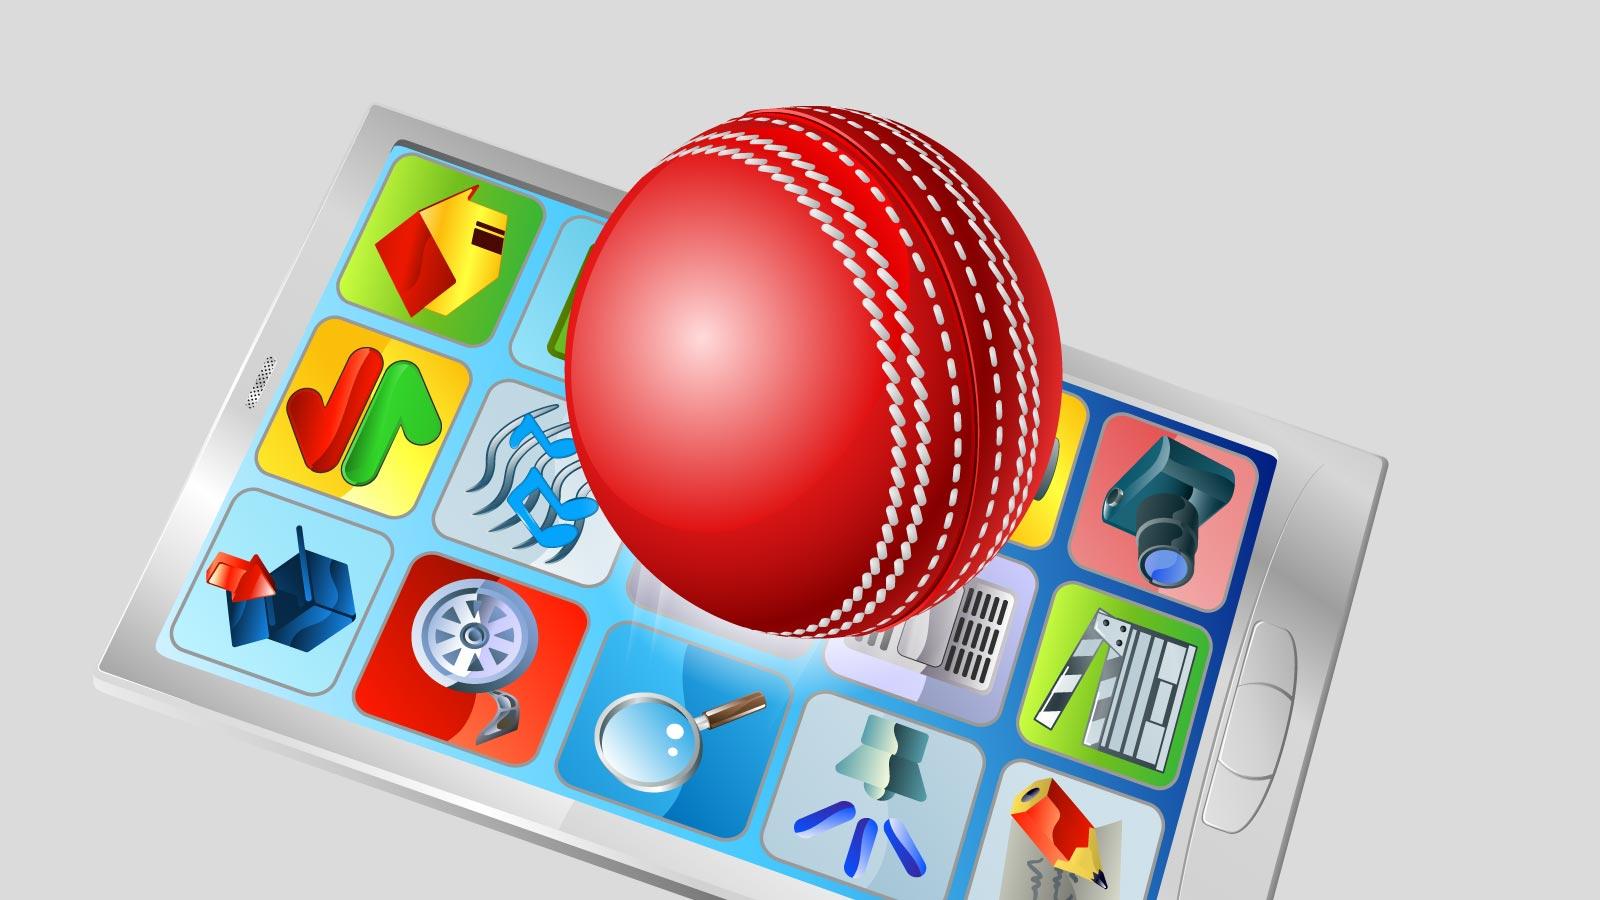 Olbg cricket betting tips iowa vs minnesota football betting line